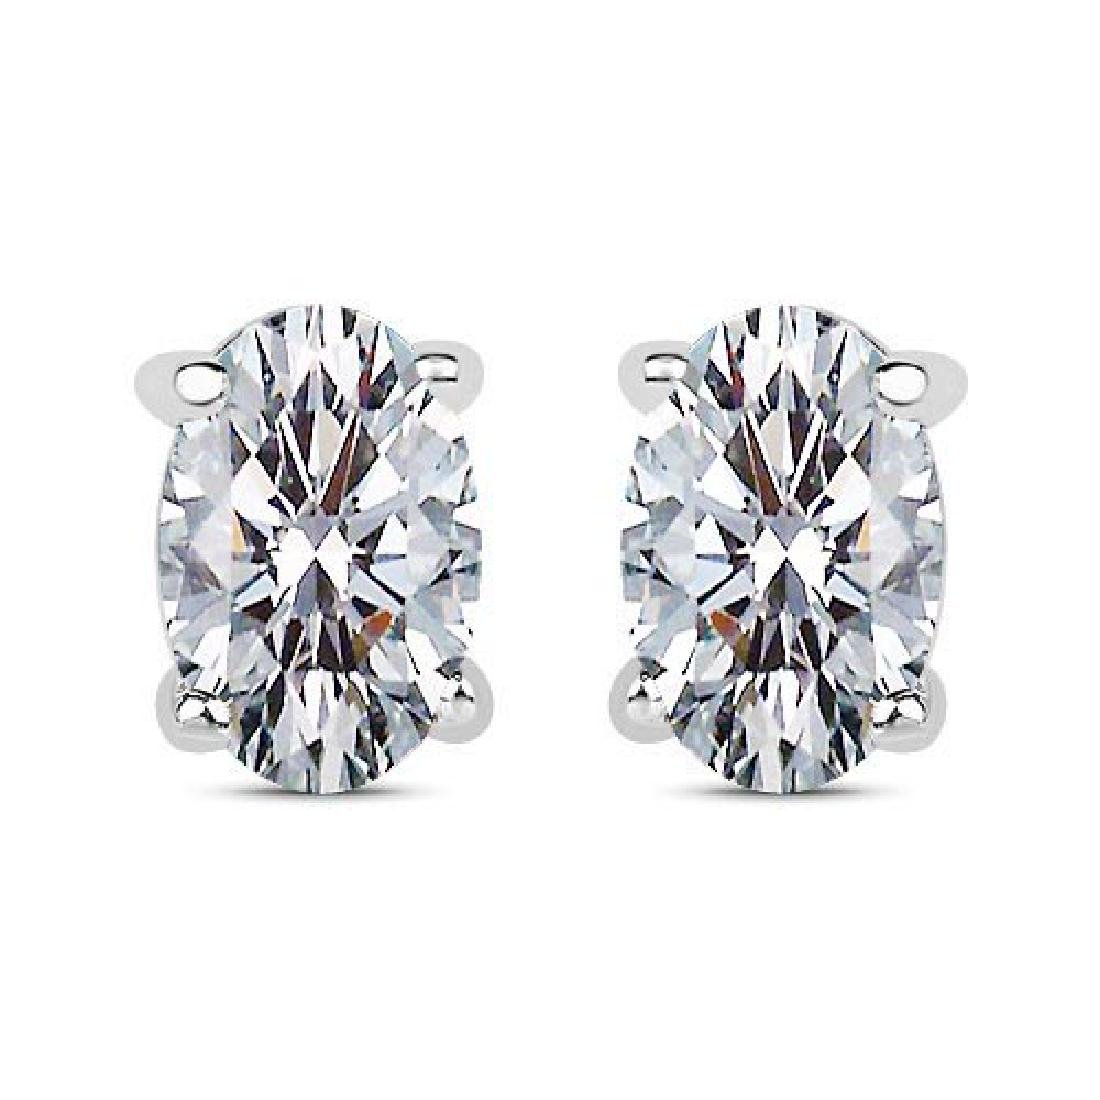 Certified 1.00 CTW Oval Diamond 14K White Gold Earring